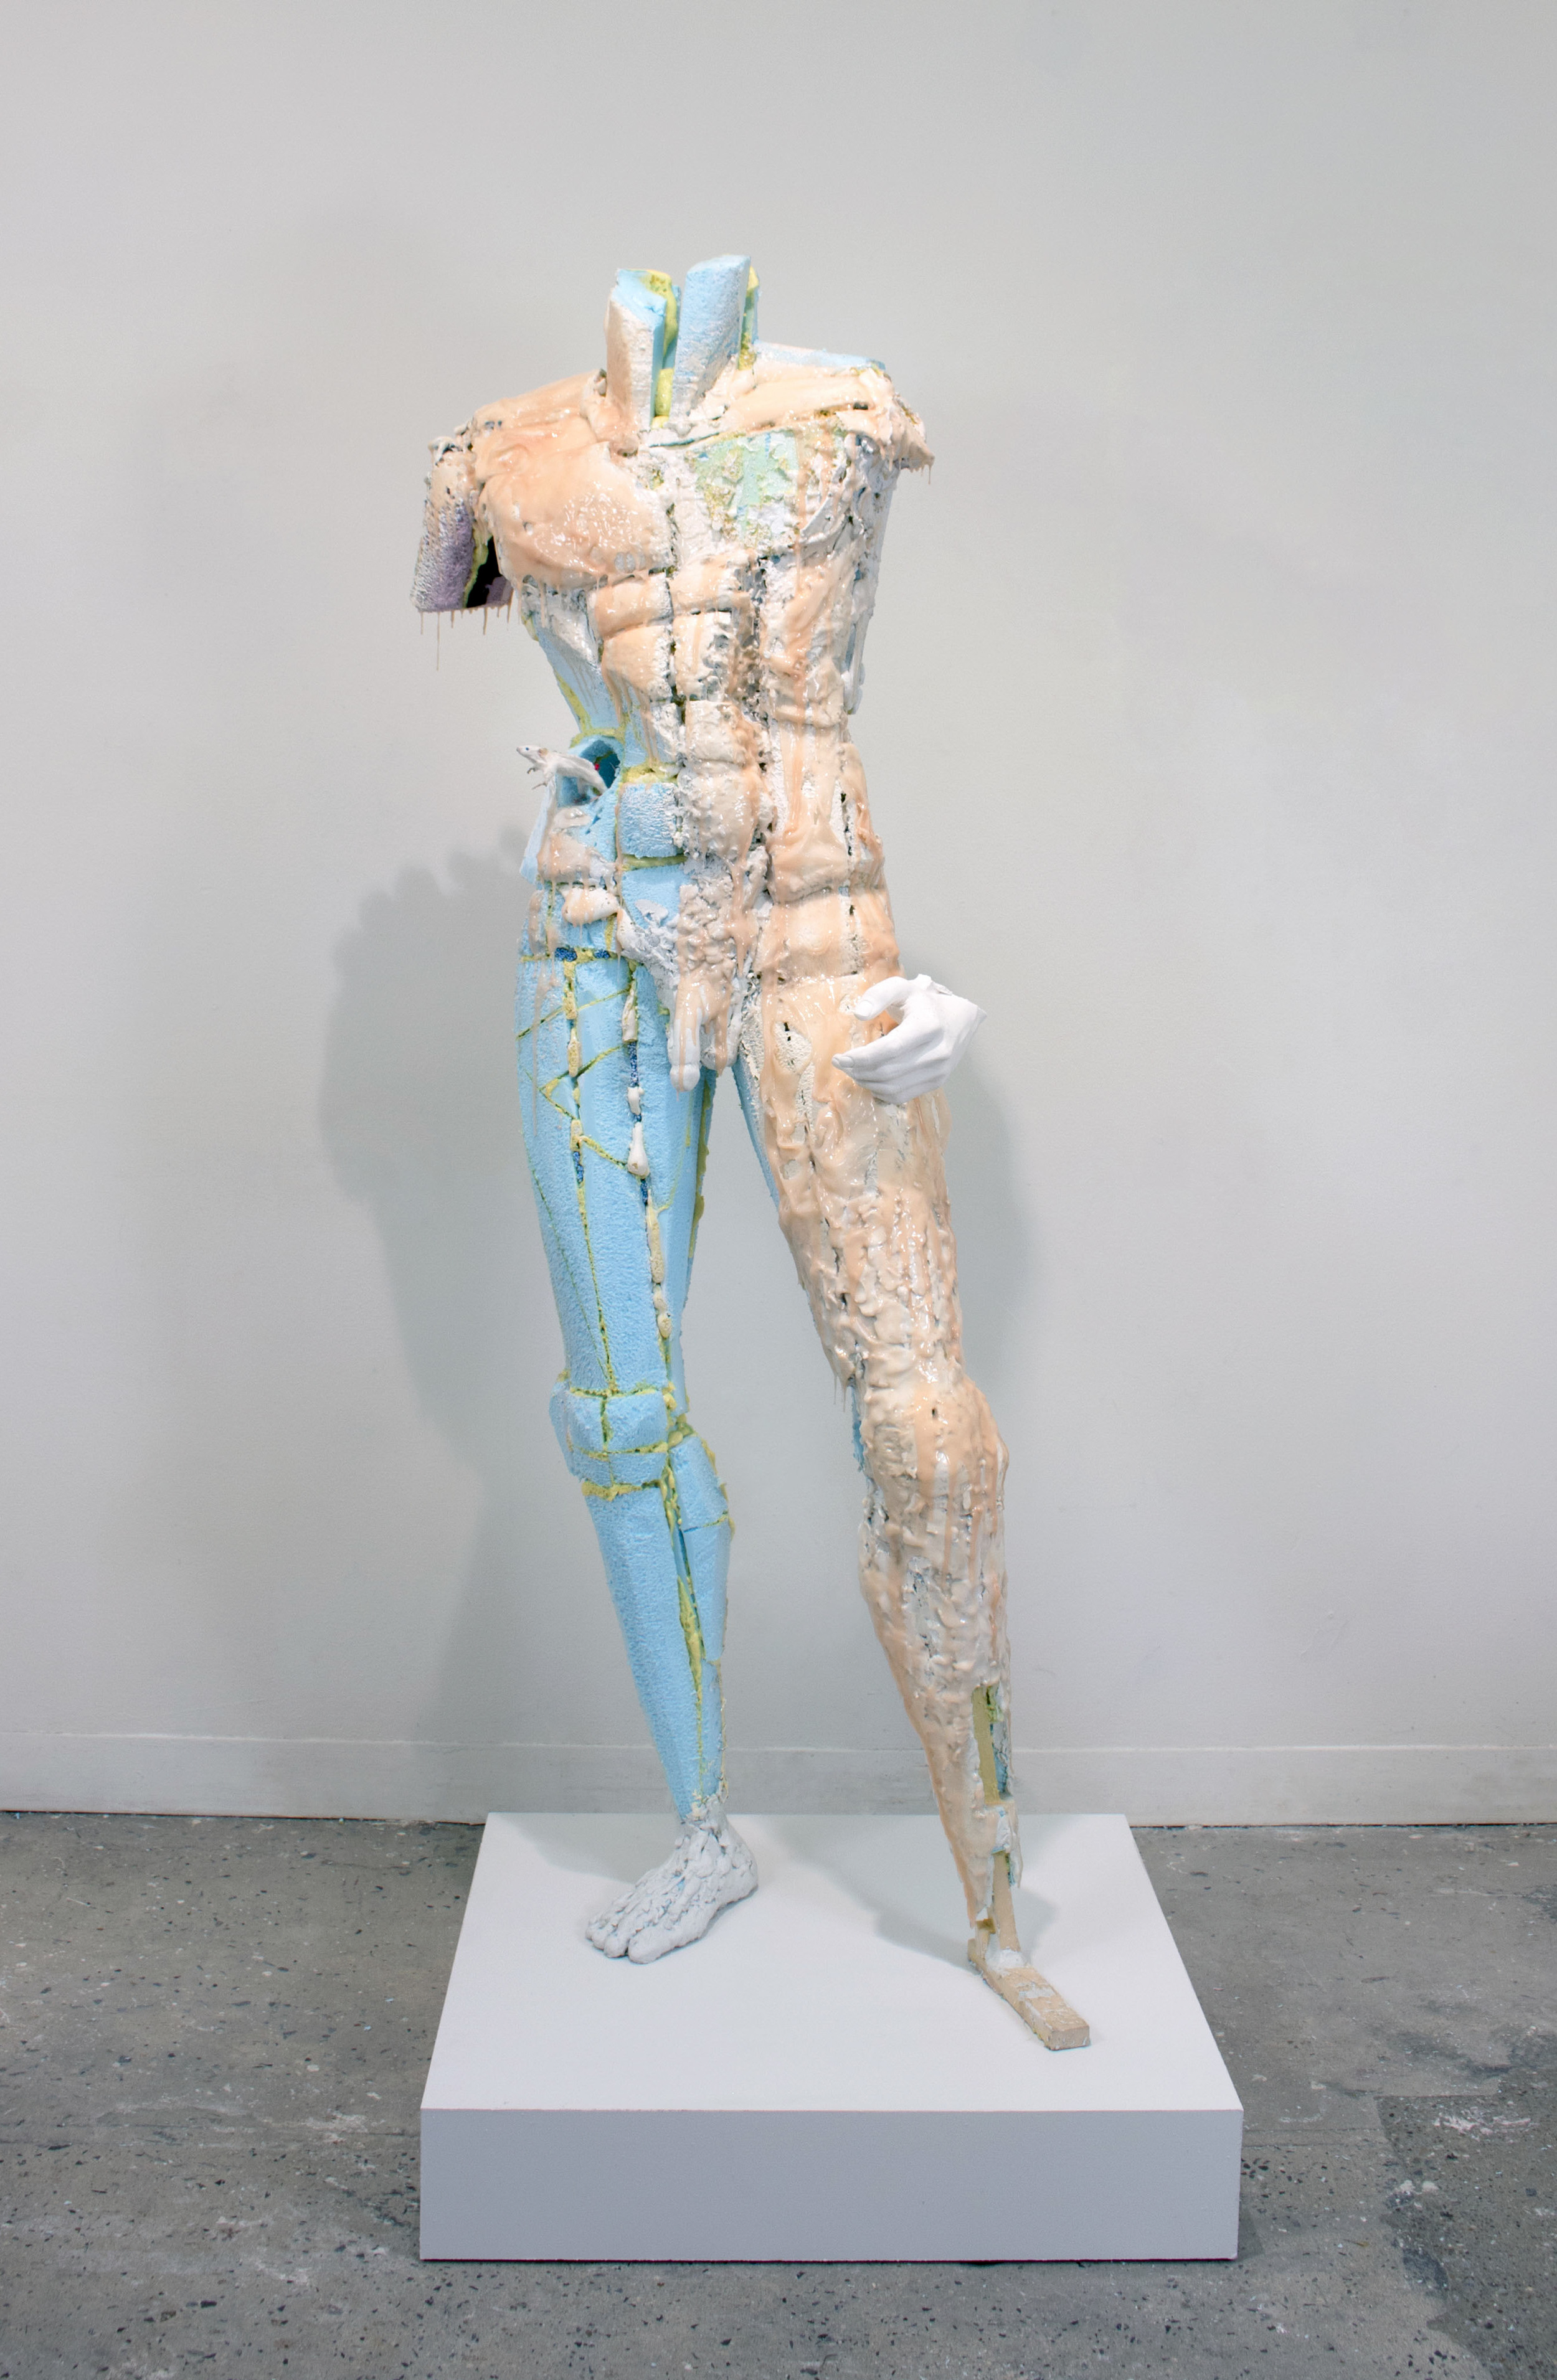 Legs of Styrofoam,Feet of Clay